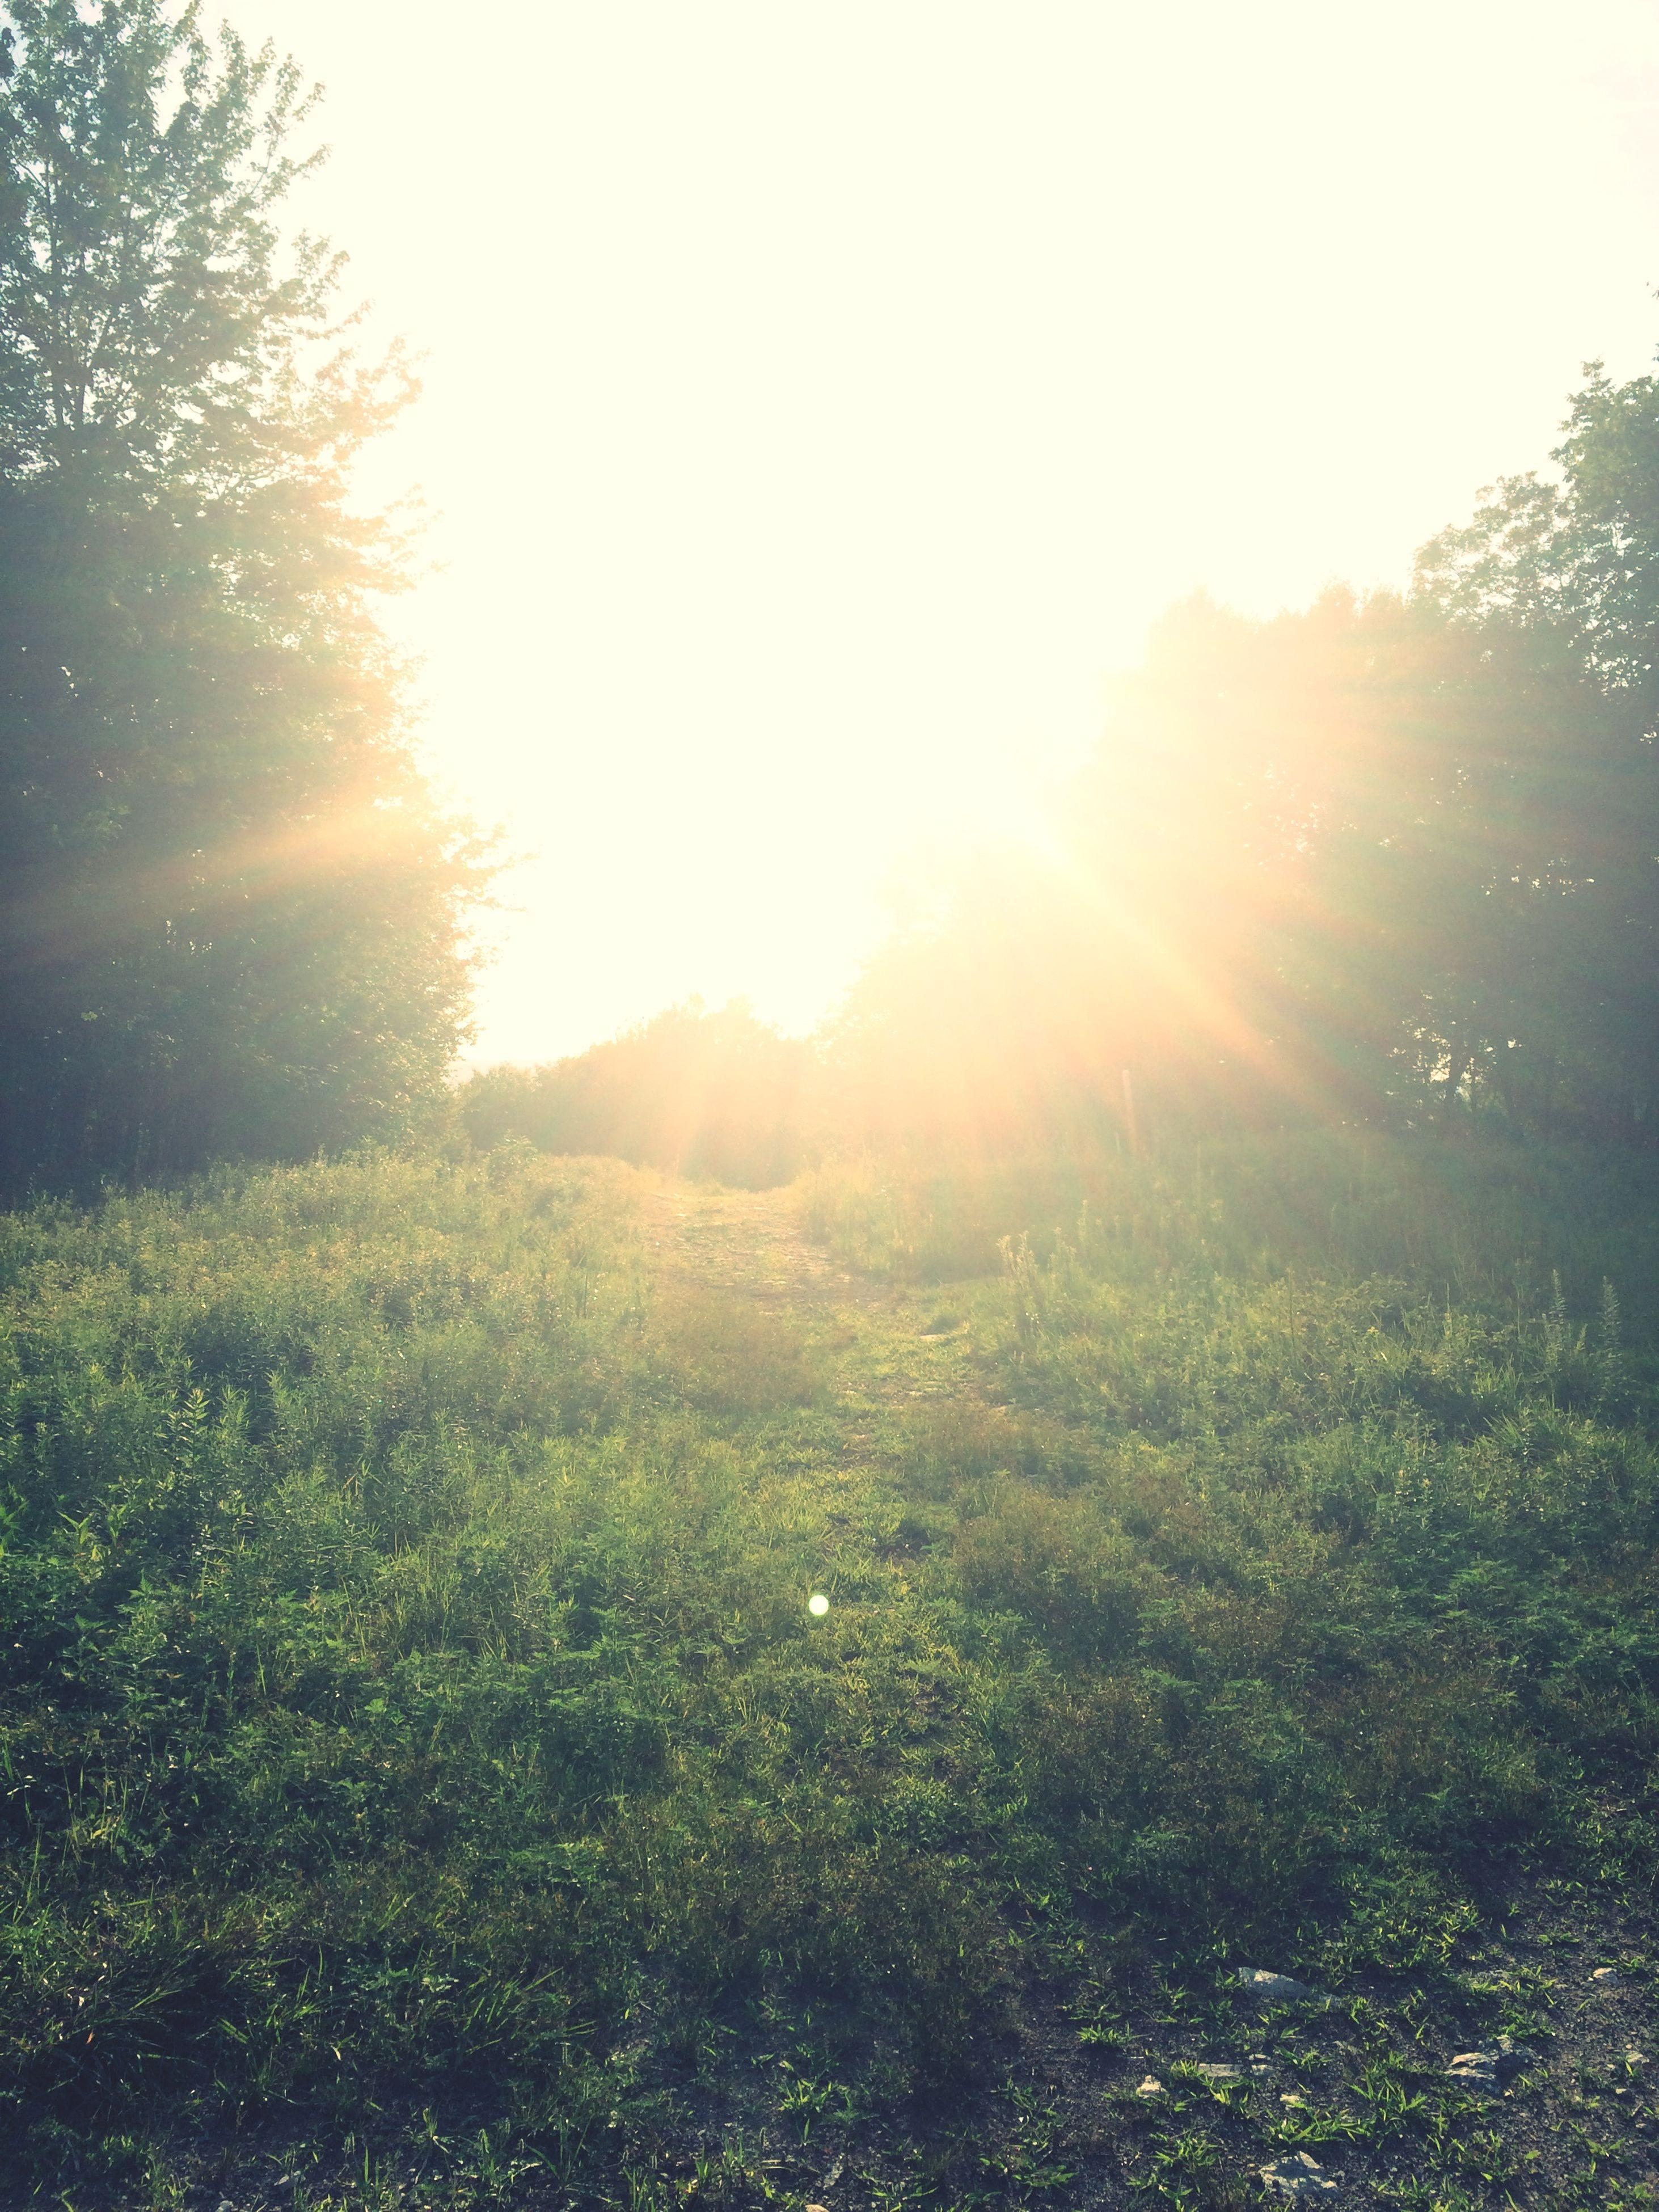 sun, sunbeam, sunlight, lens flare, tree, tranquil scene, tranquility, clear sky, beauty in nature, growth, scenics, nature, landscape, field, bright, grass, sunny, sky, sunset, idyllic